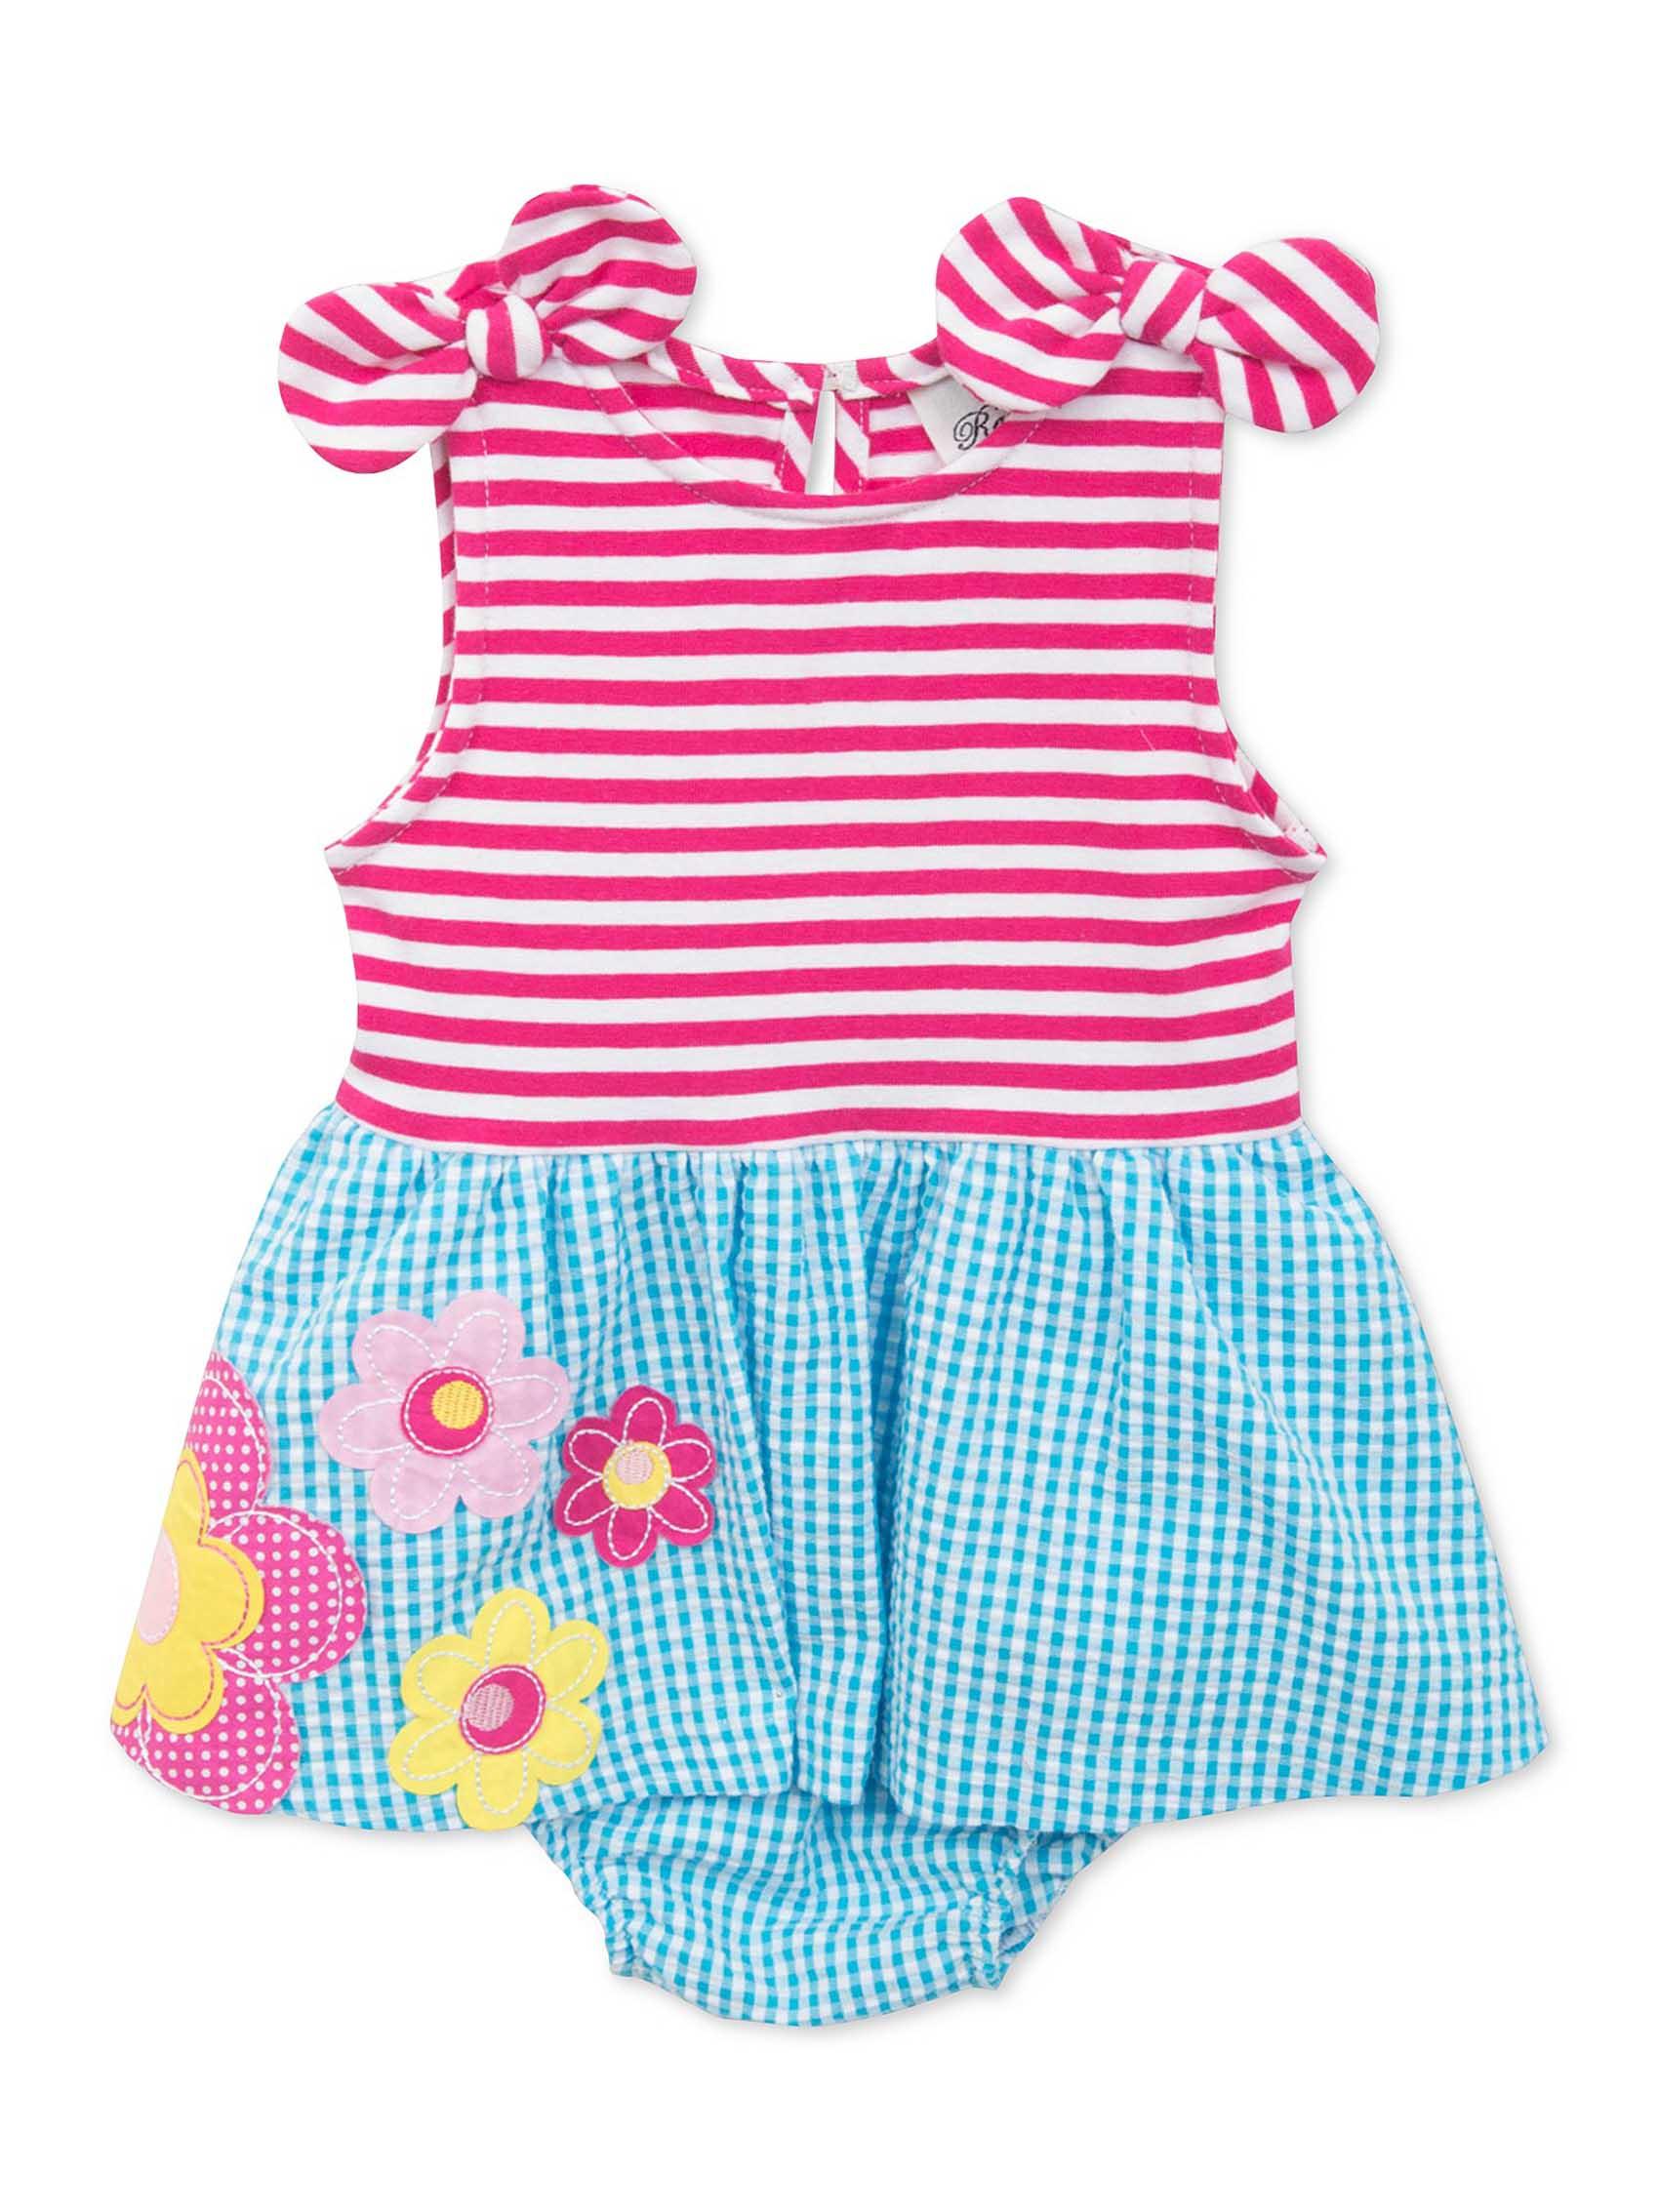 2479e3bf10f1 Rare Editions Baby Girls 2-Piece Dress & Diaper Cover Set - Mixed Print